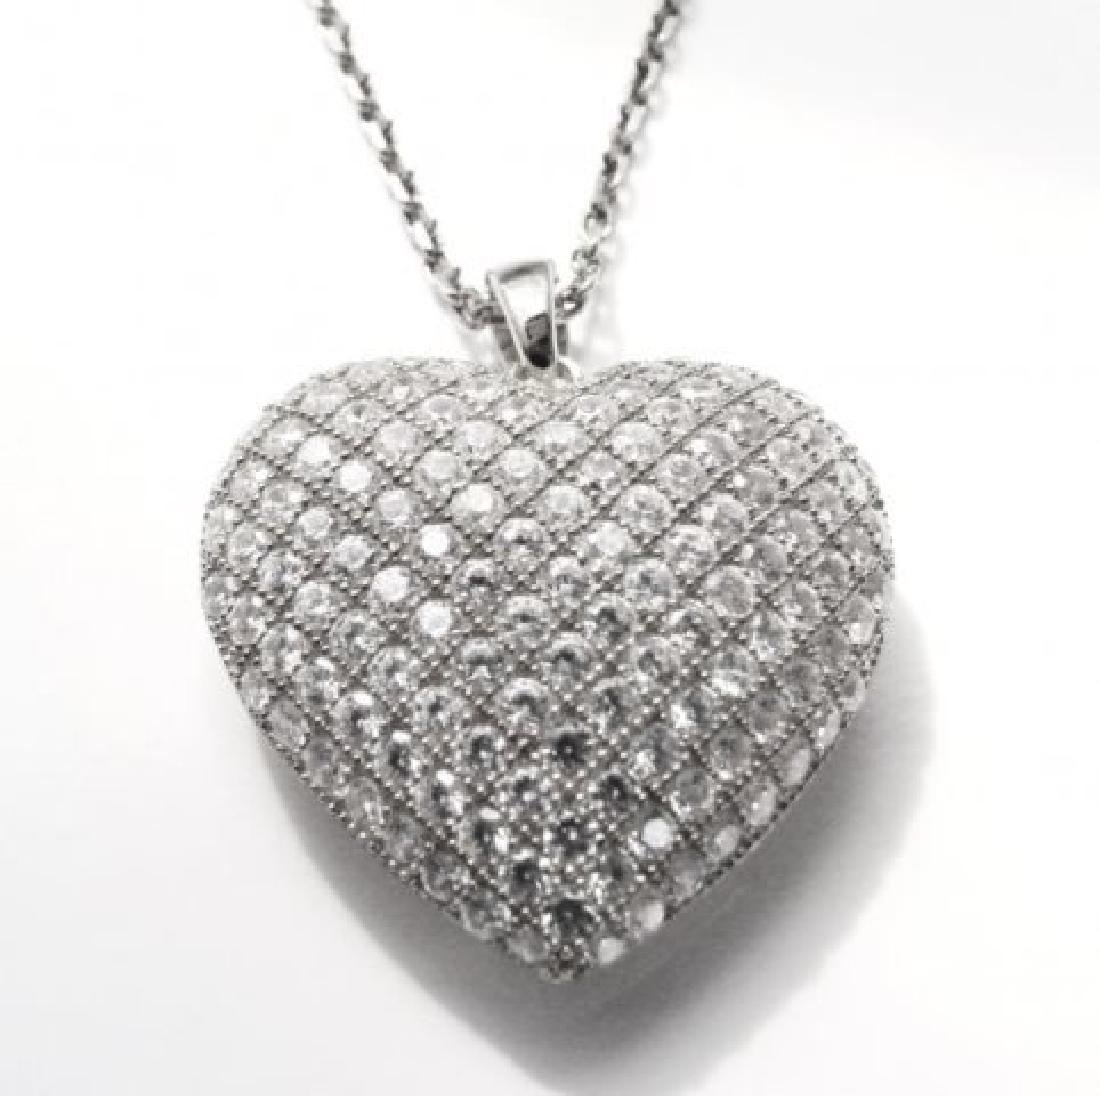 Creation Diamond Heart Pendant 2.00ct 18kW/g Over